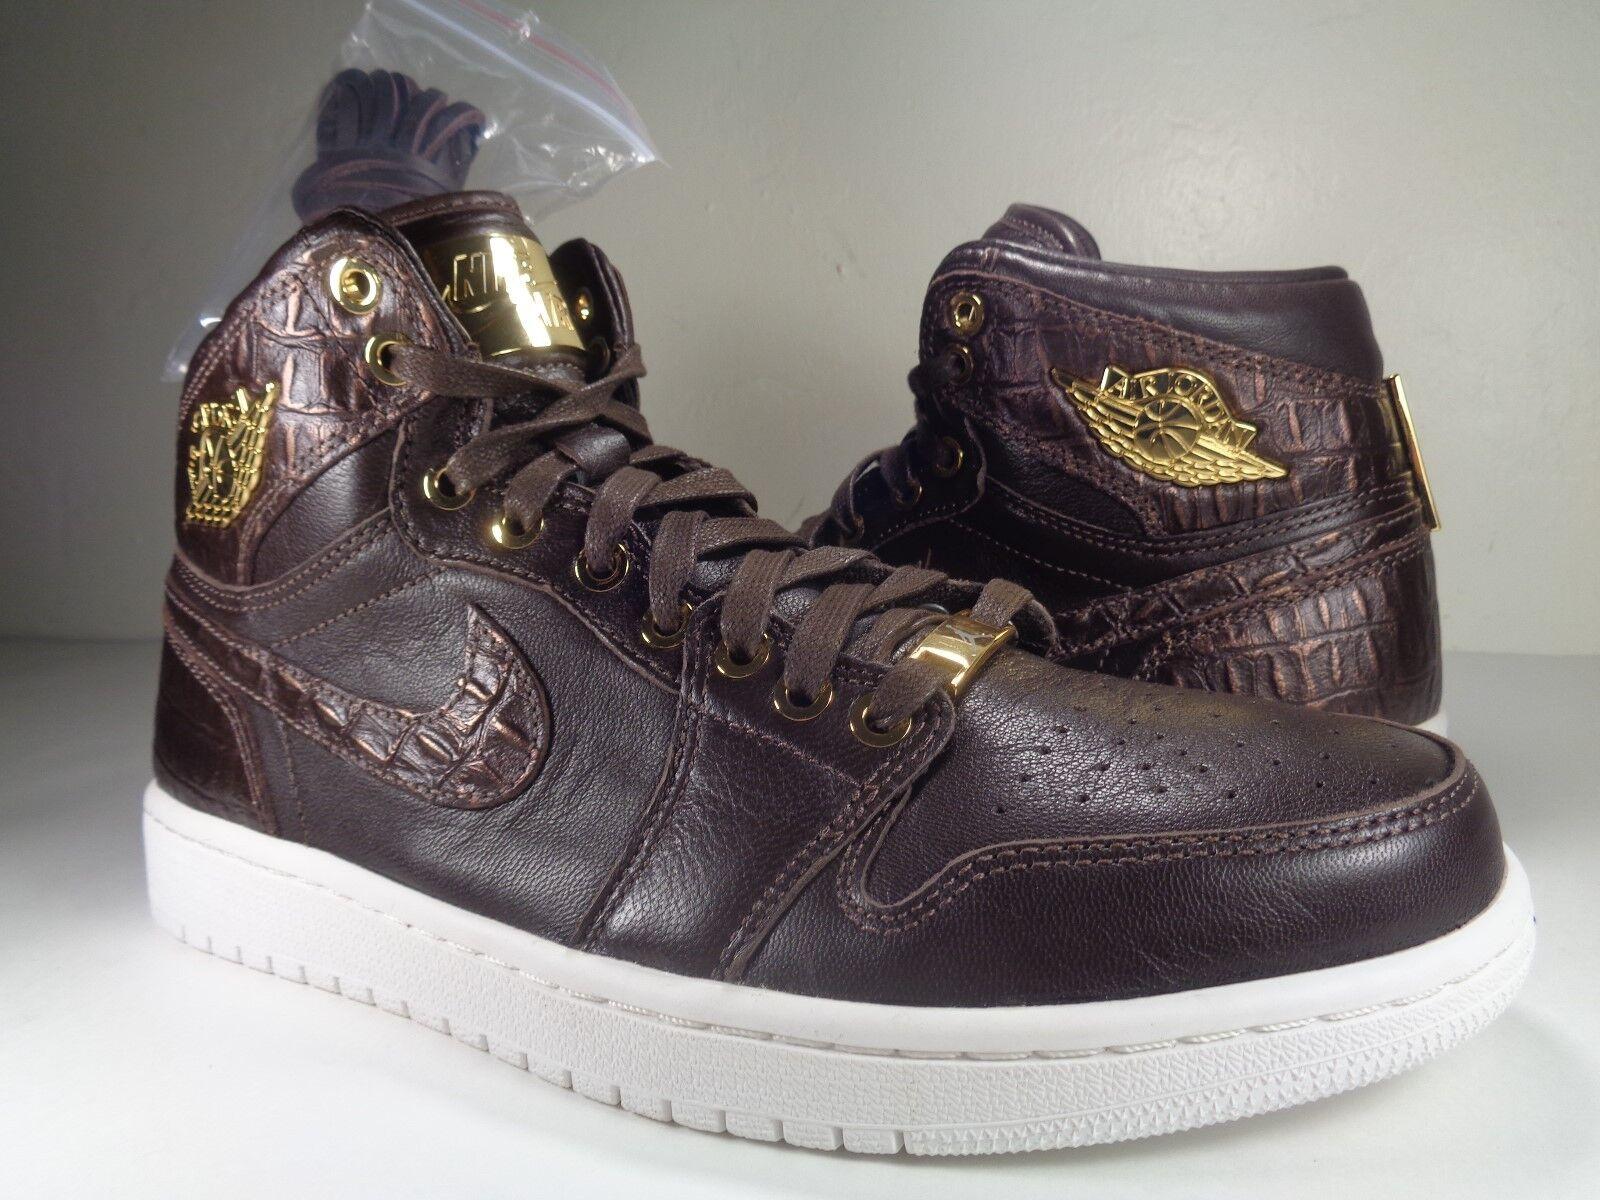 Nike Air Jordan 1 Pinnacle blanc Baroque Brown Metallic Gold blanc Pinnacle SZ 9 2be9b4